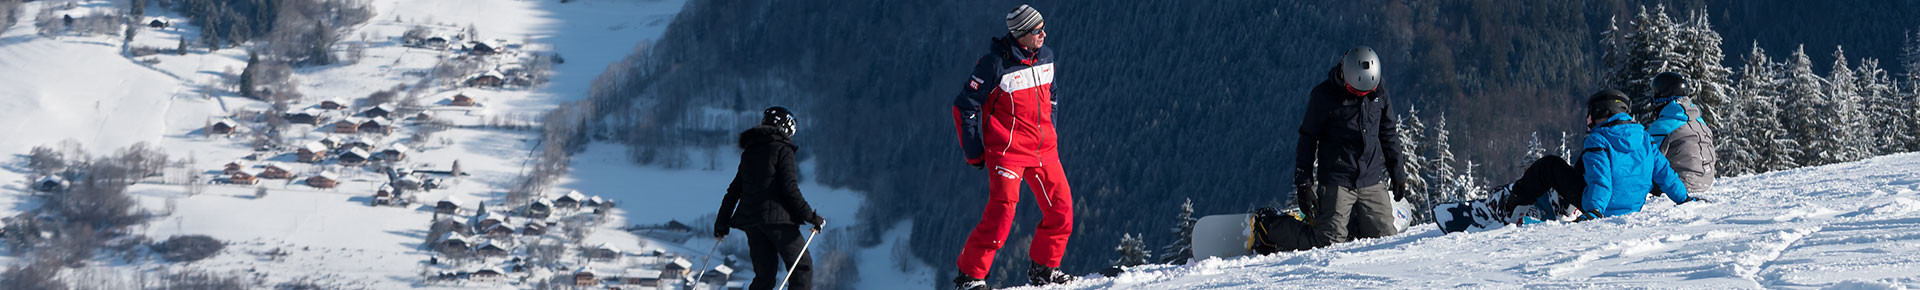 Saint Jean d'Aulps Ski school